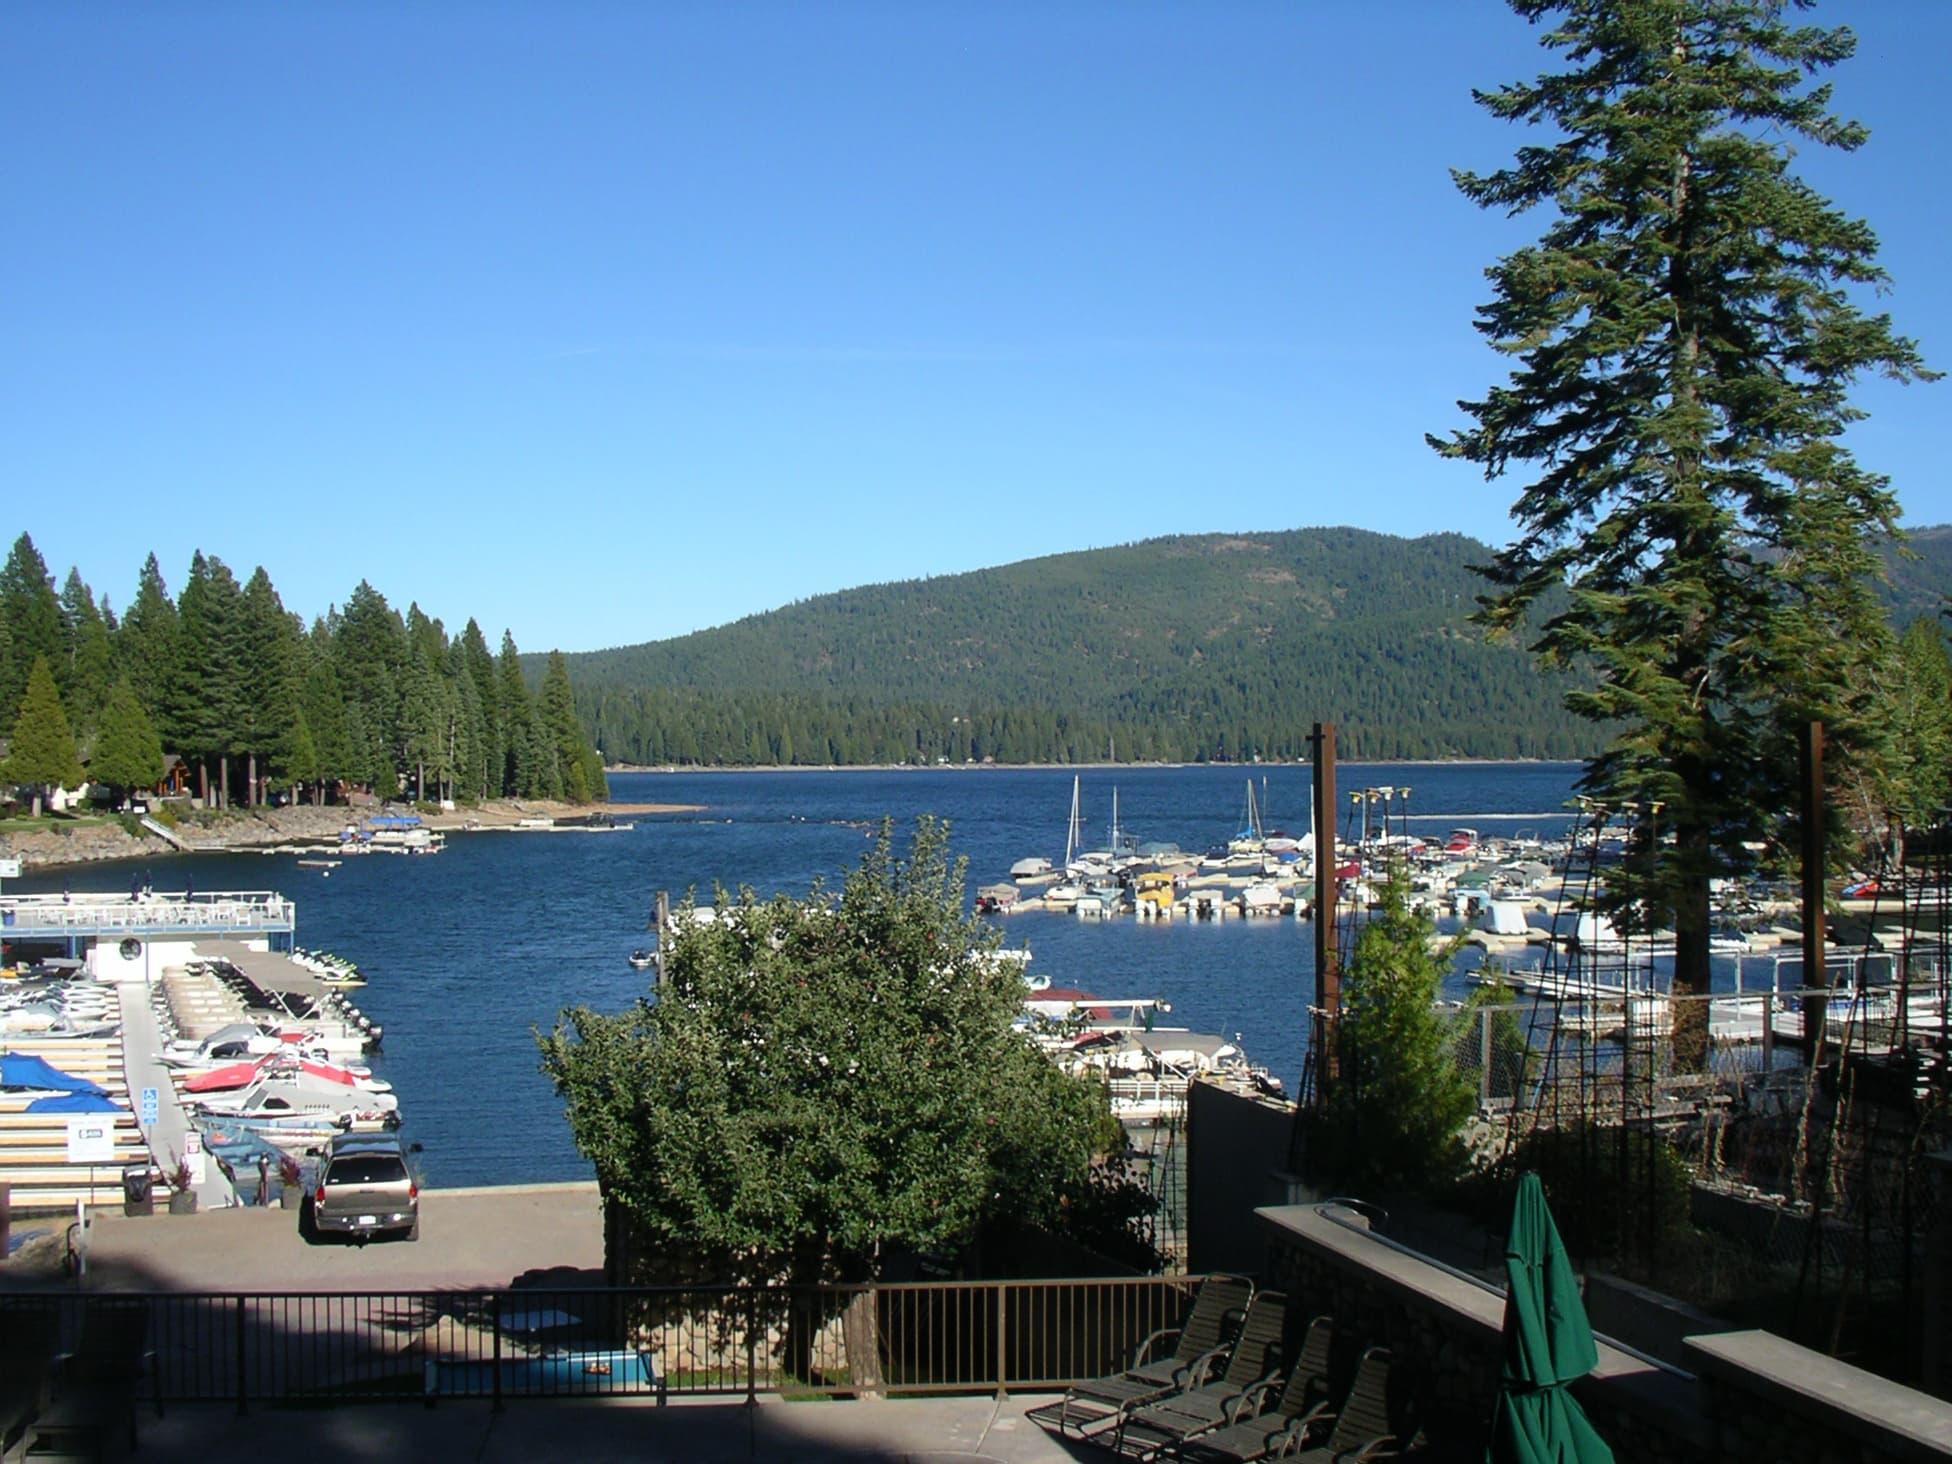 Lake Almanor California